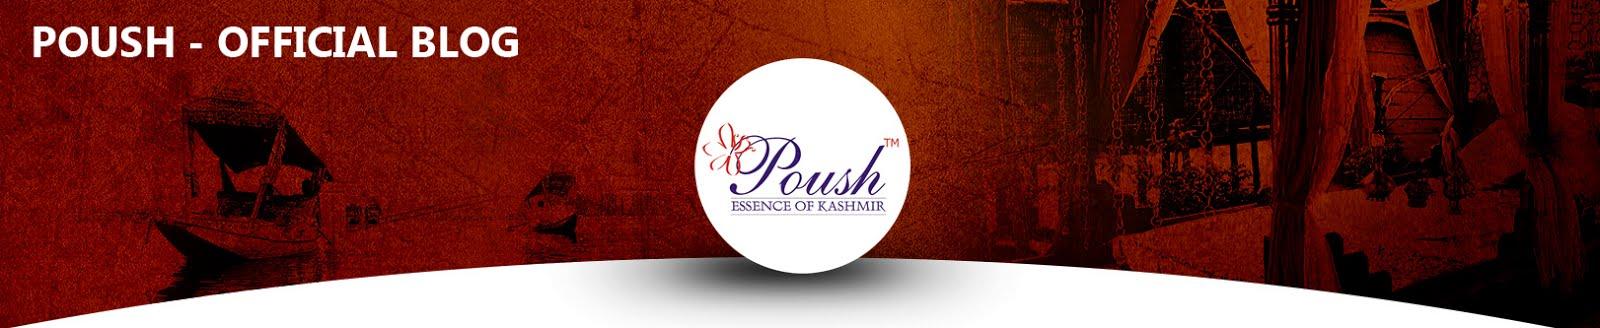 Poush - Essence of Kashmir (Blog)